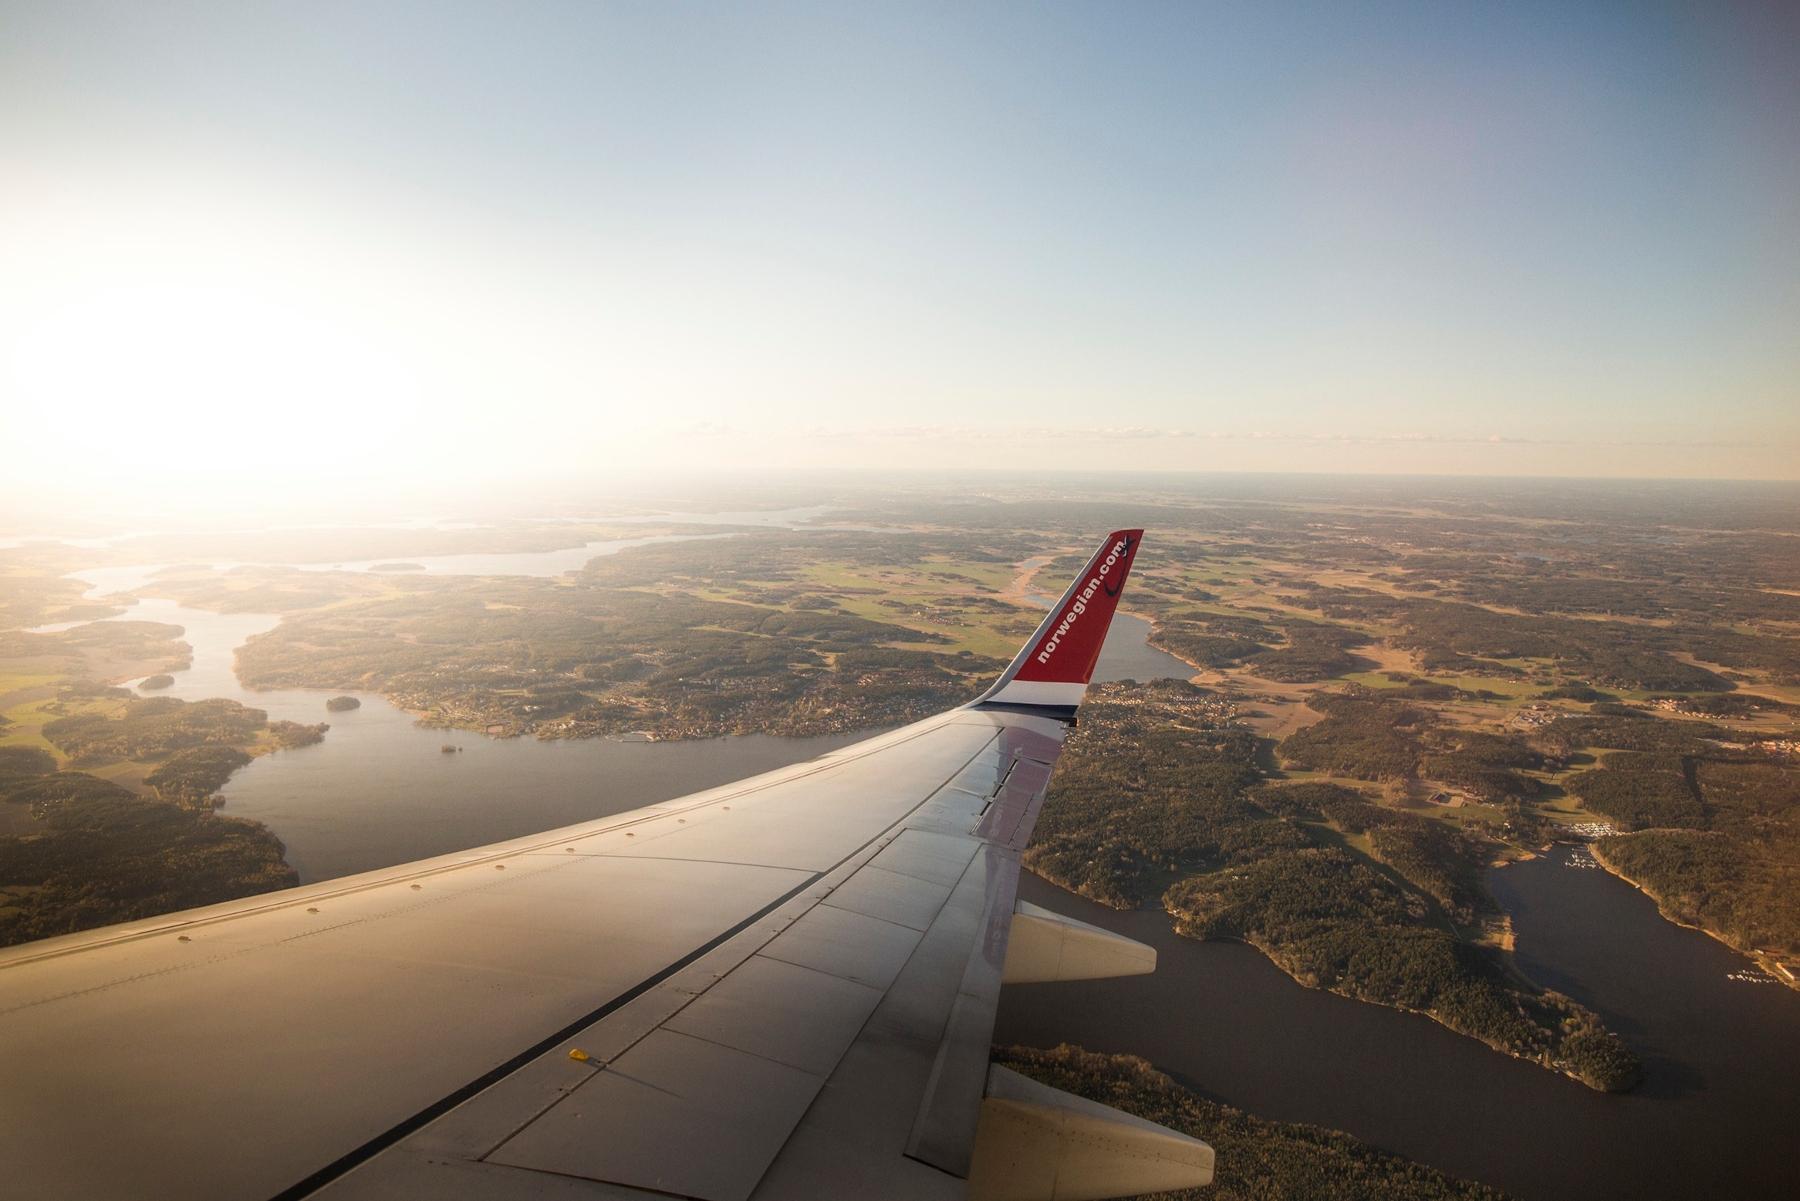 Norwegian kembali ke Bandara Manchester – tempat Anda dapat terbang dan cara memesan tiket